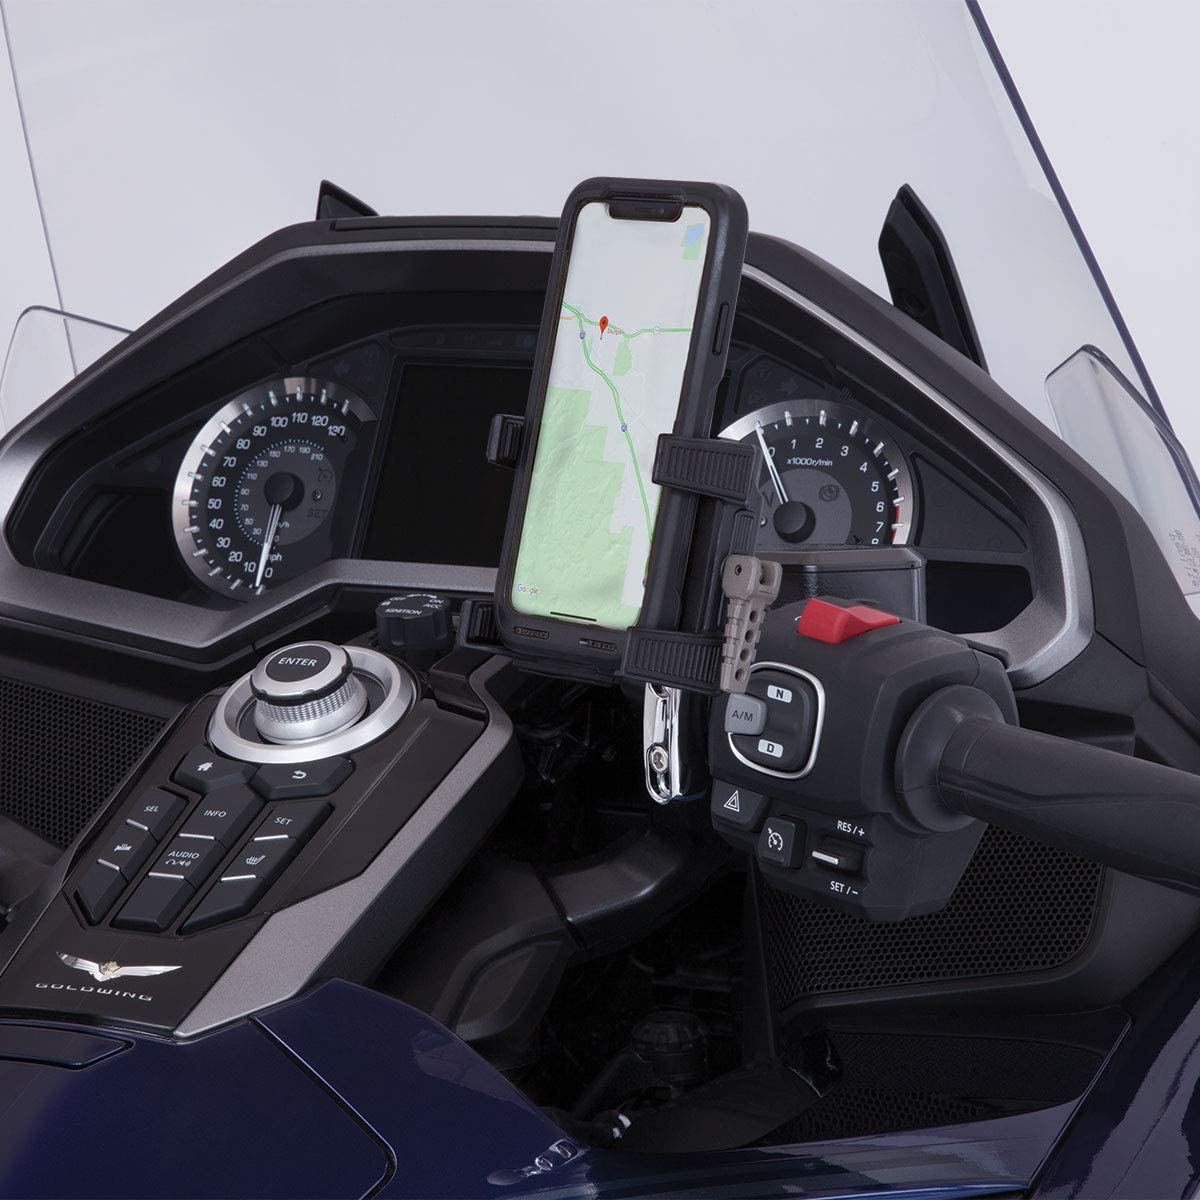 Goldstrike Smartphone Holder with Black Left Side Accessory Mount for Gold Wing